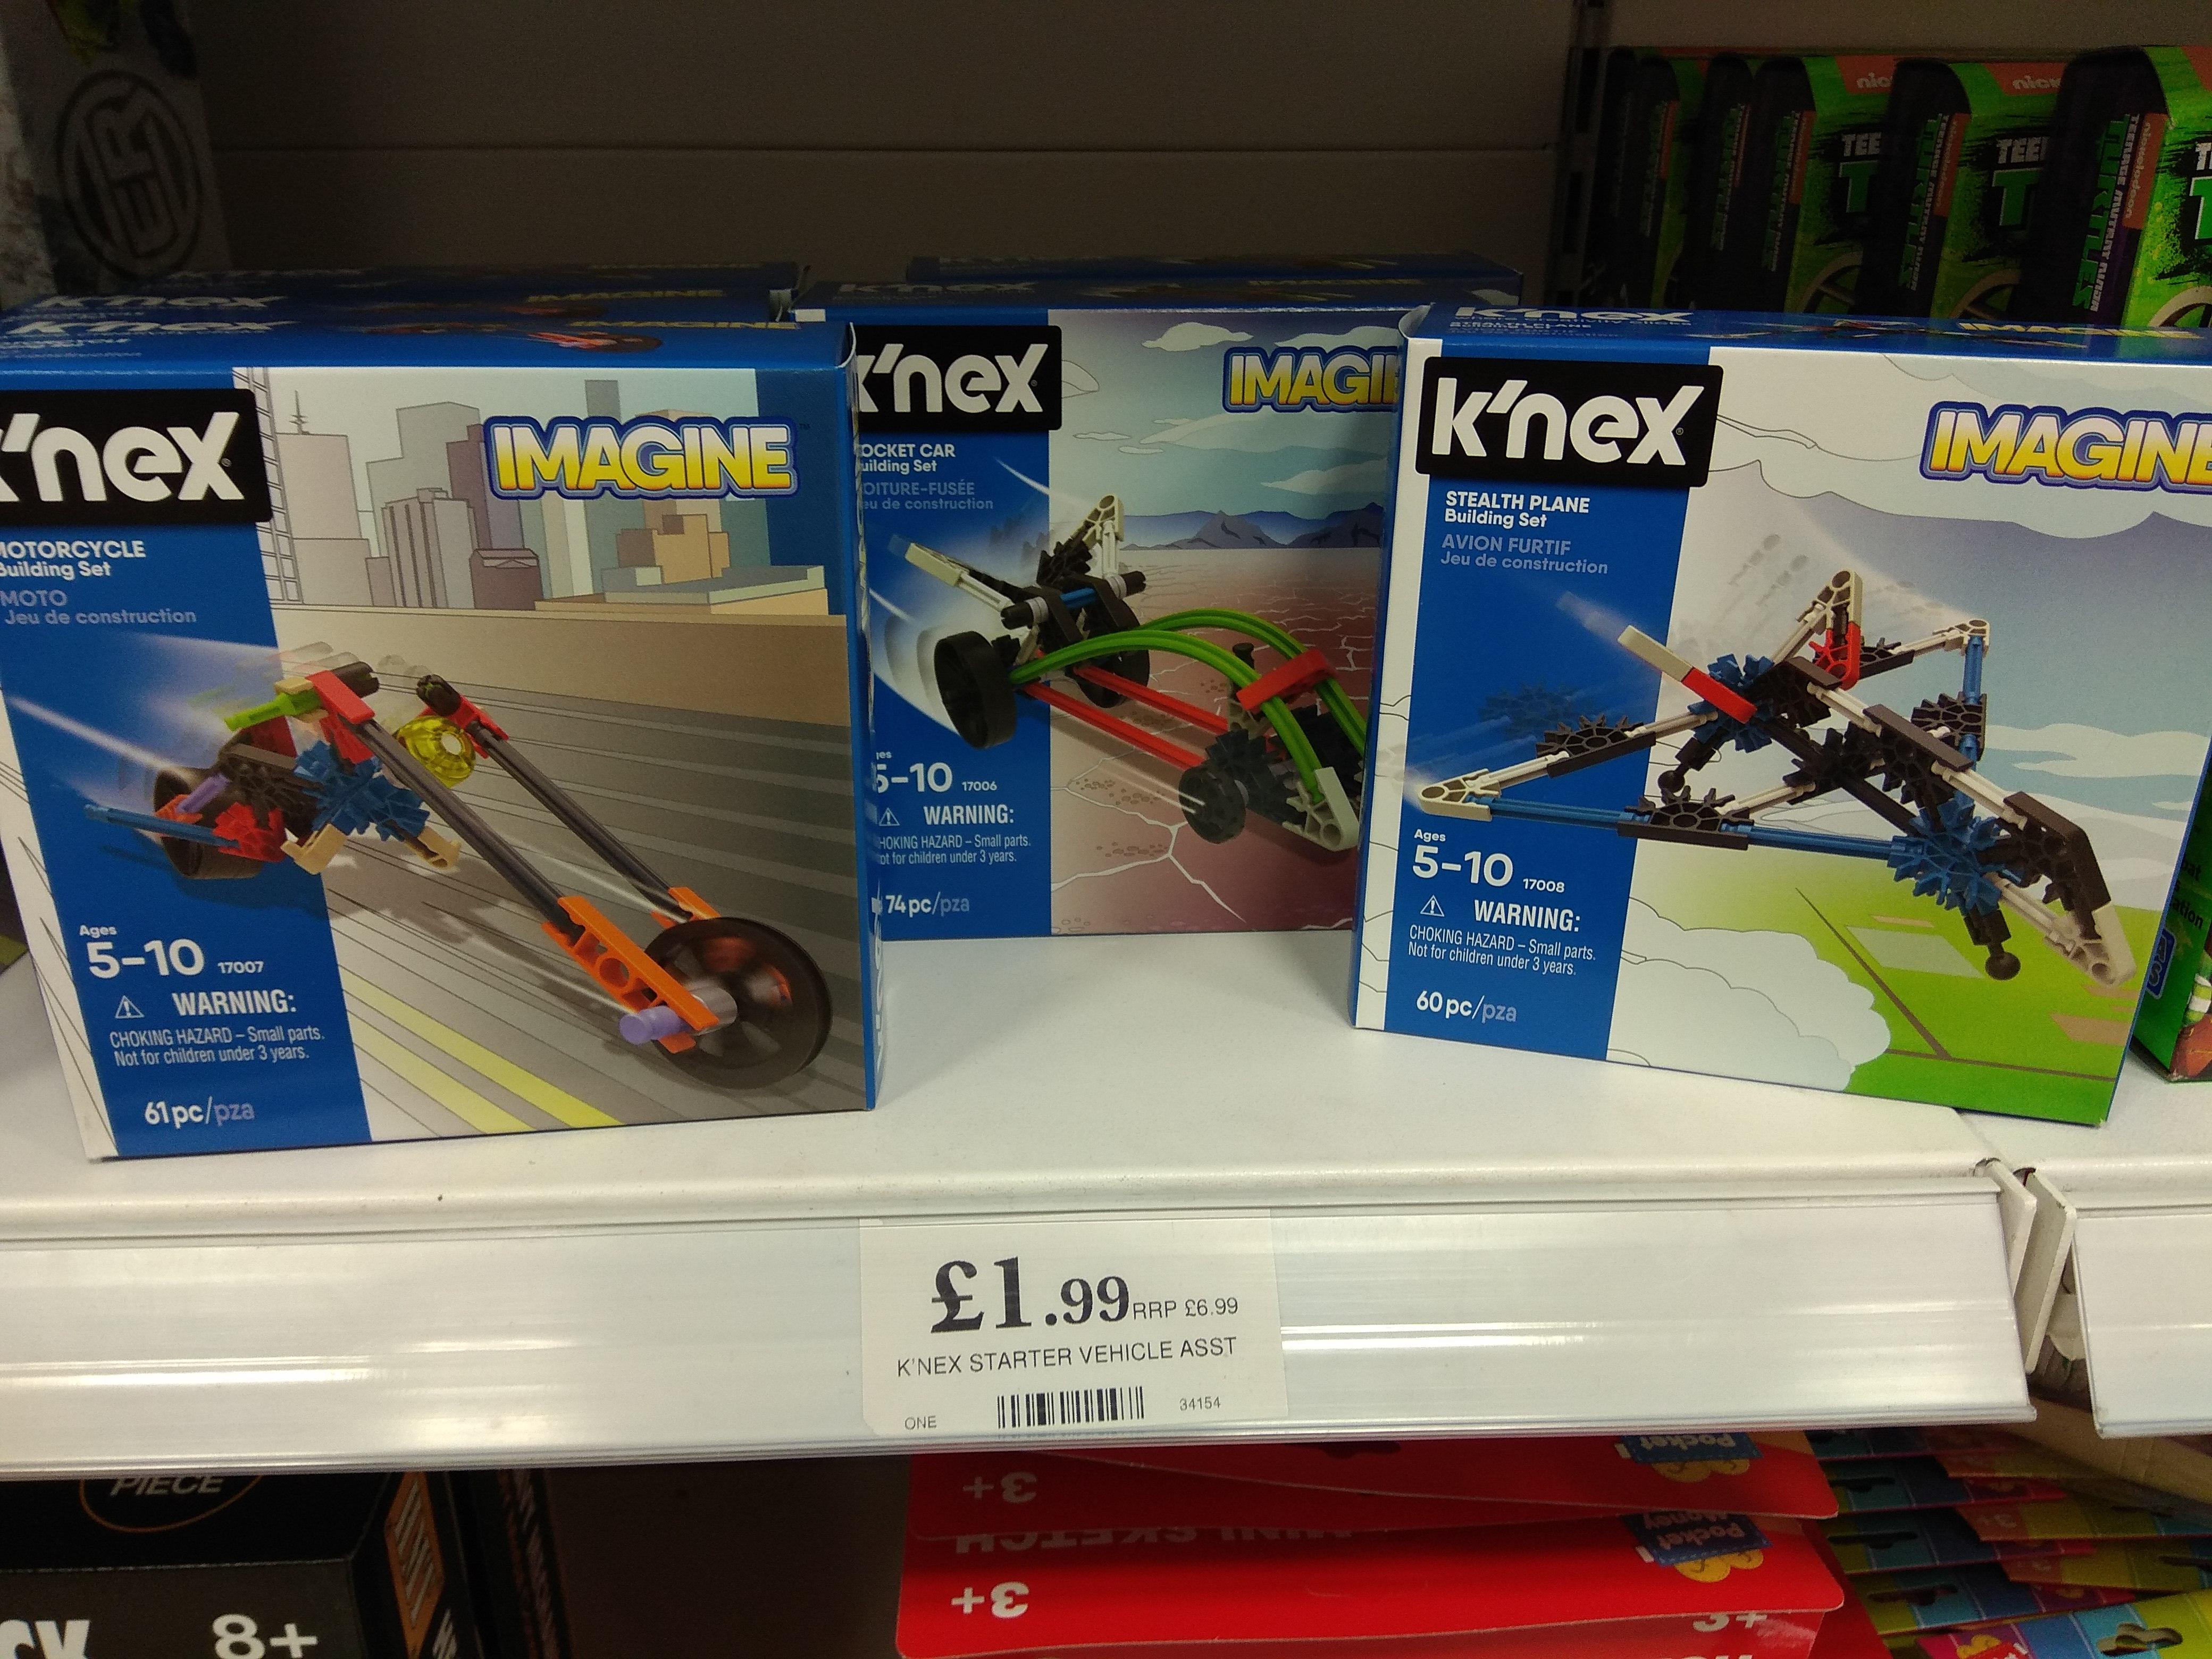 Home Bargains K'Nex Imagine Building Kits - Rocket Car, Stealth Plane & Motorcycle. £1.99 each.